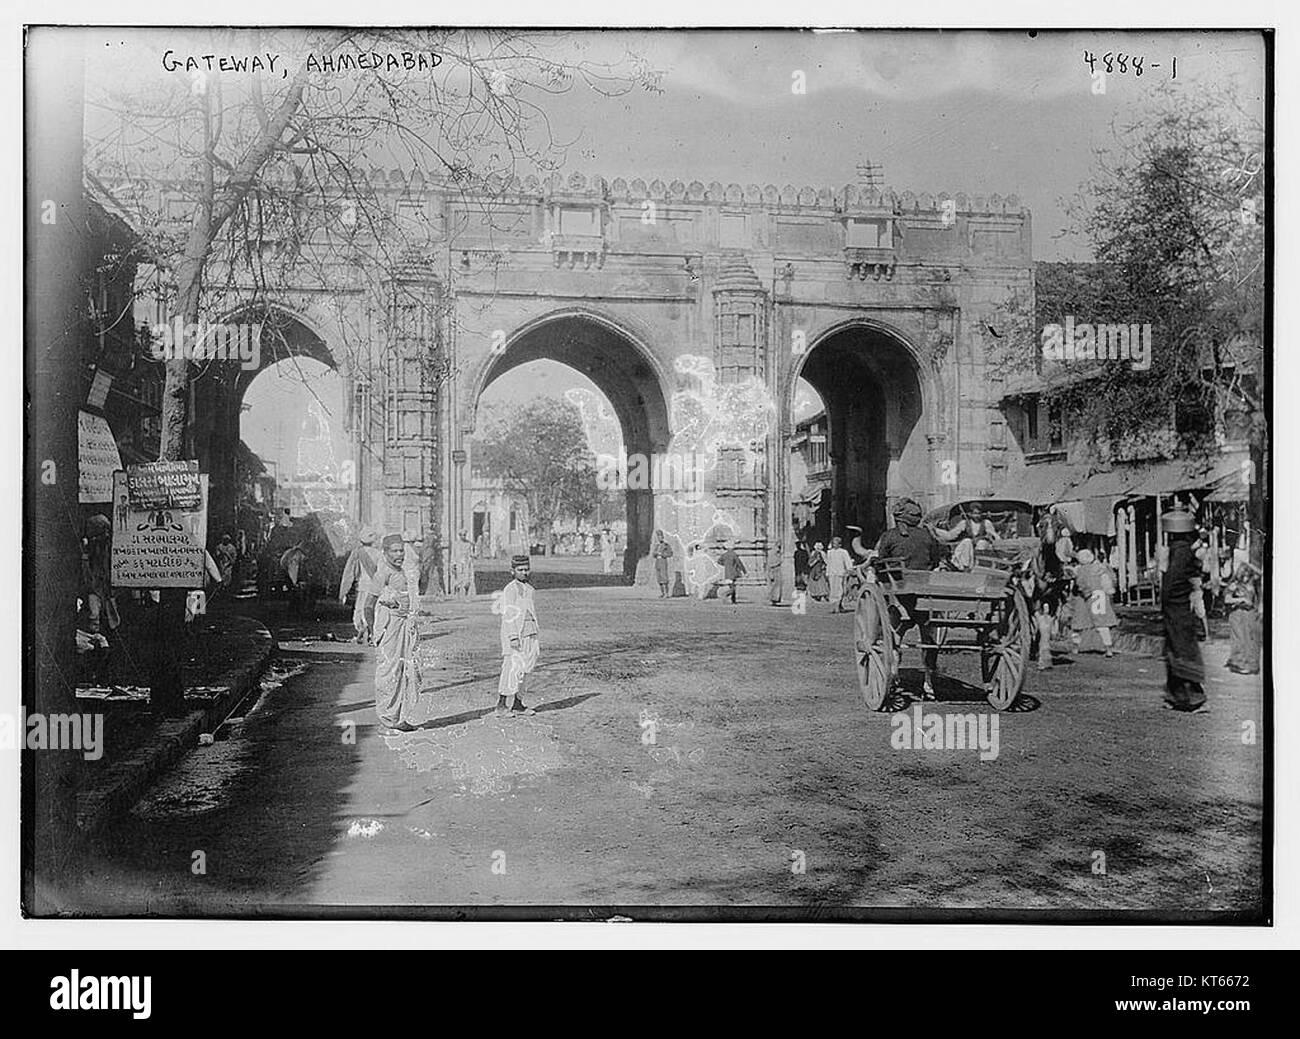 Teen Darwaza, Gateway, Ahmedabad  (31479977313) - Stock Image